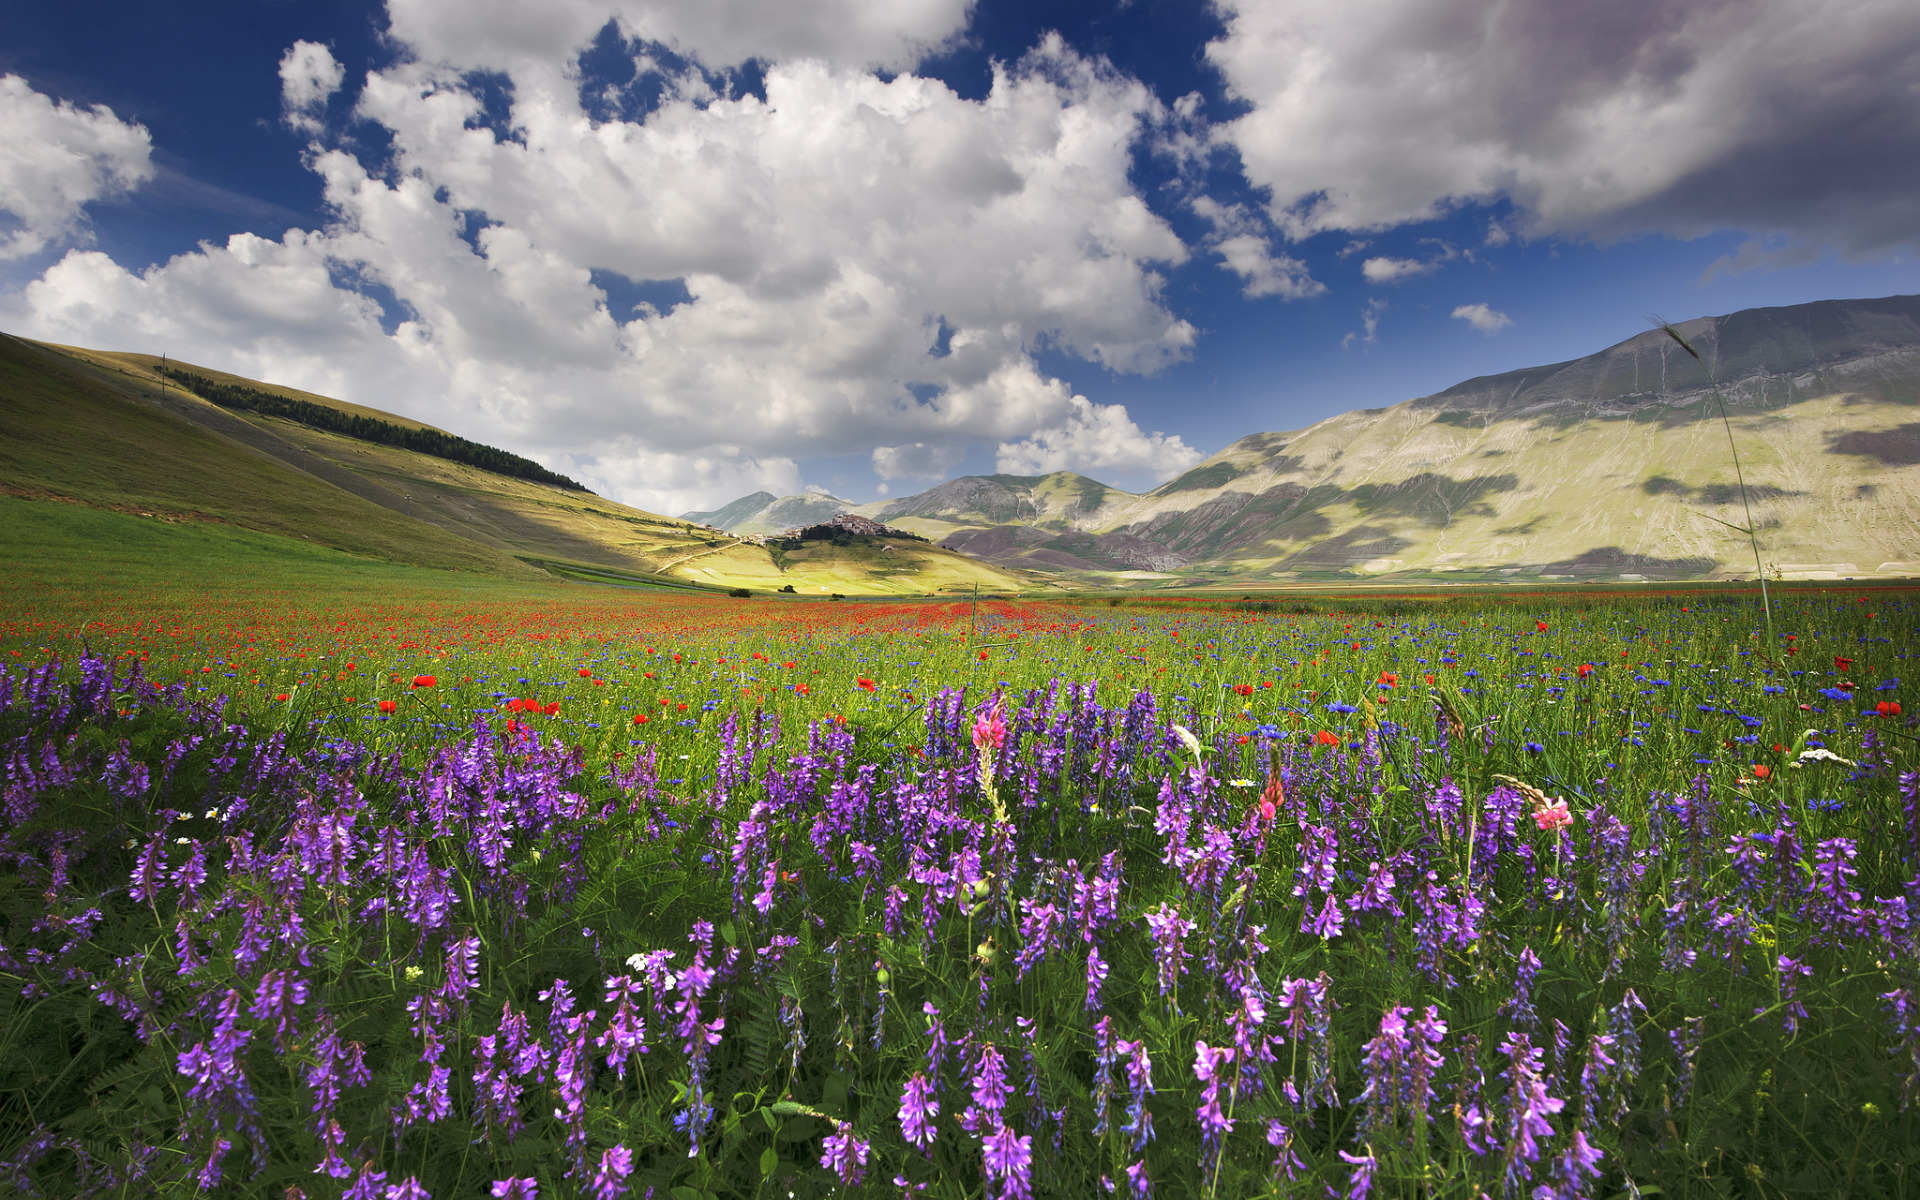 поляна цветы трава холмы горы glade flowers grass hills mountains  № 1829210 загрузить